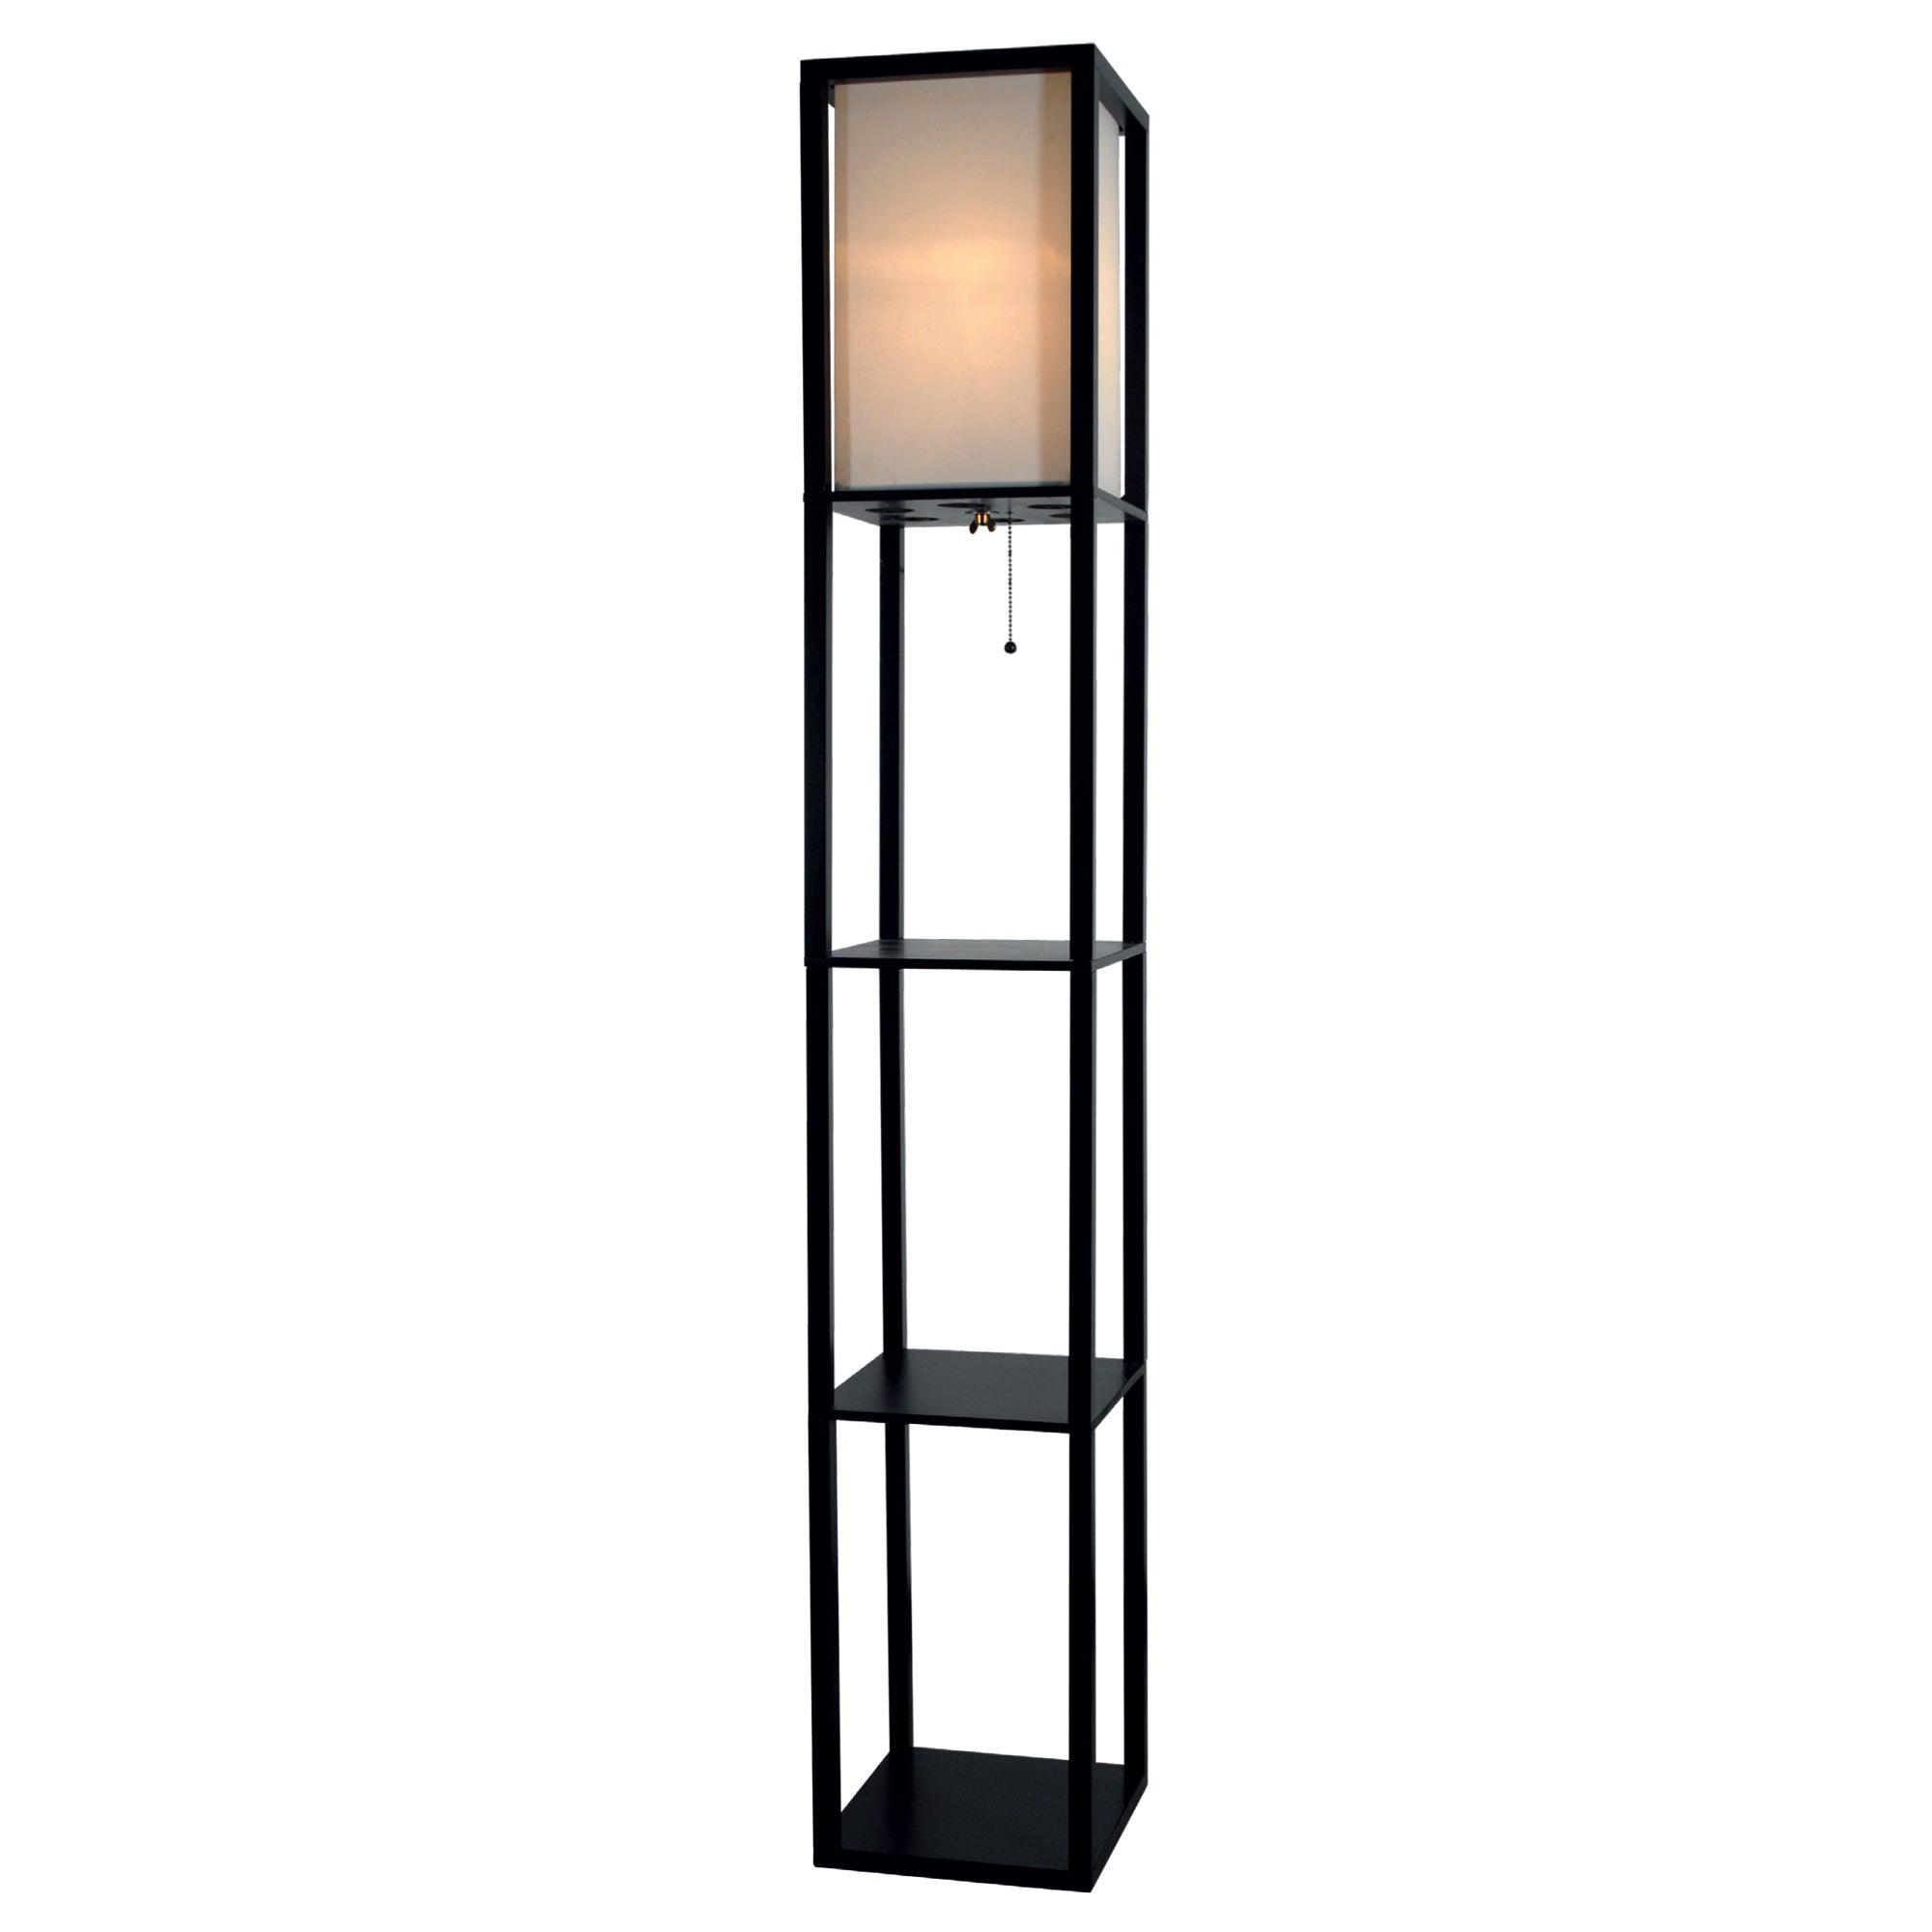 Light Accents Black Wood 3-shelf Floor Lamp With Beige Li...